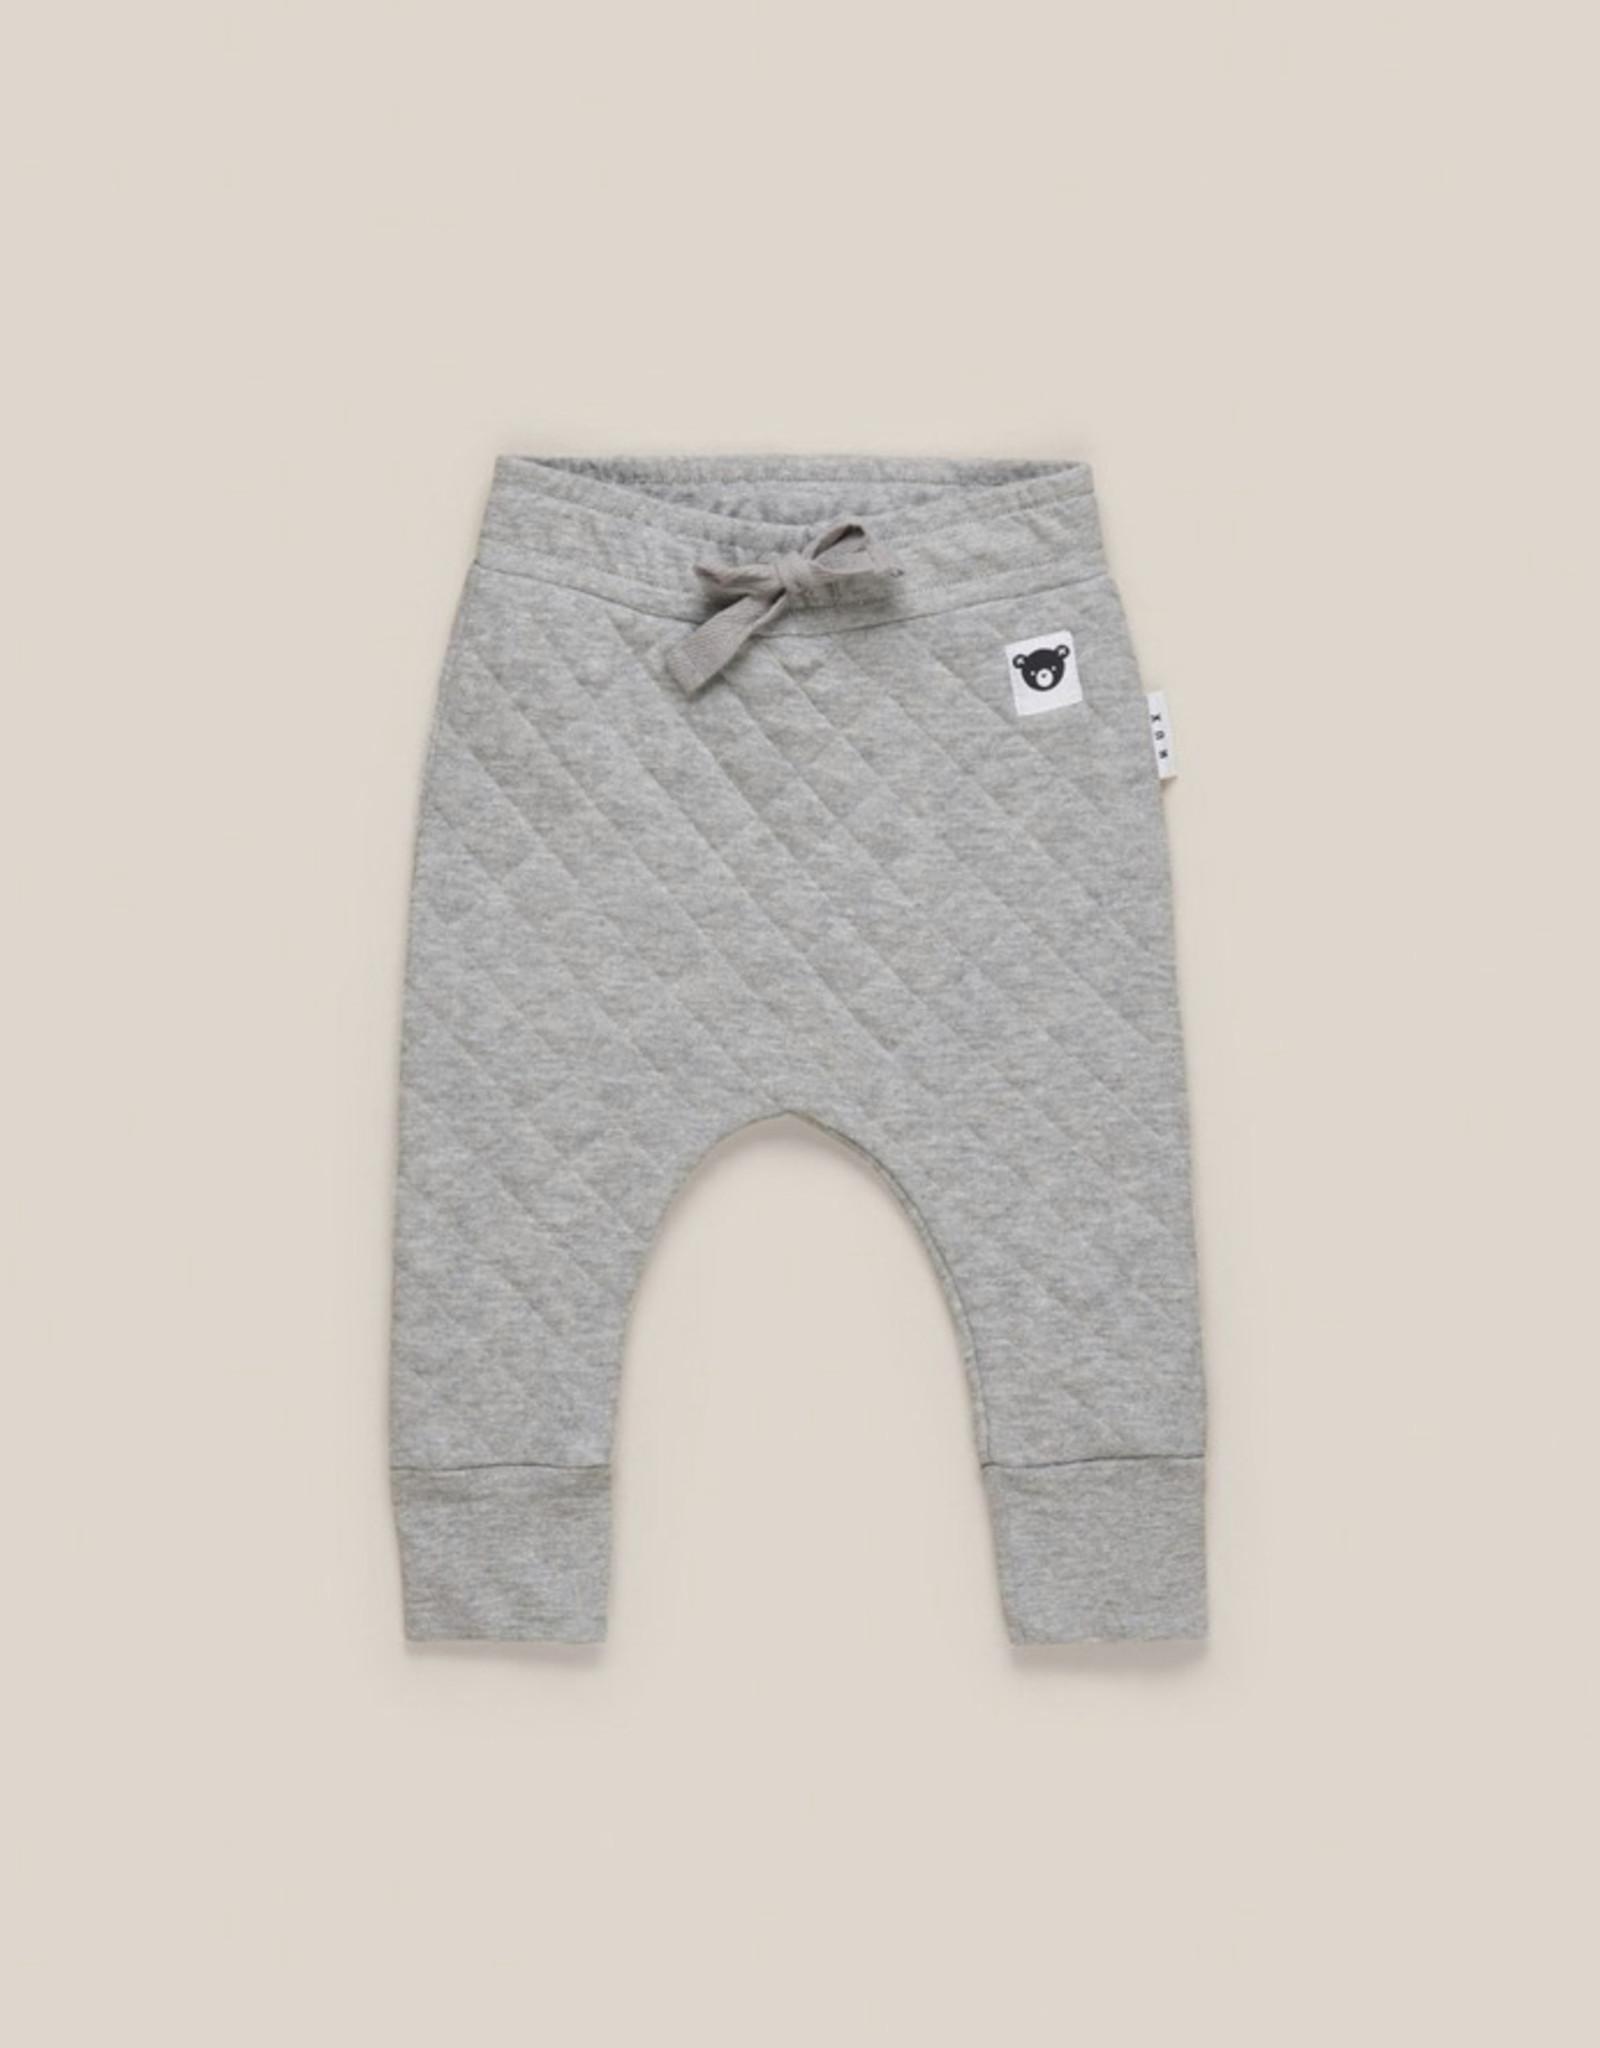 HUXBABY HuxBaby - Stitch Drop Crotch Pants